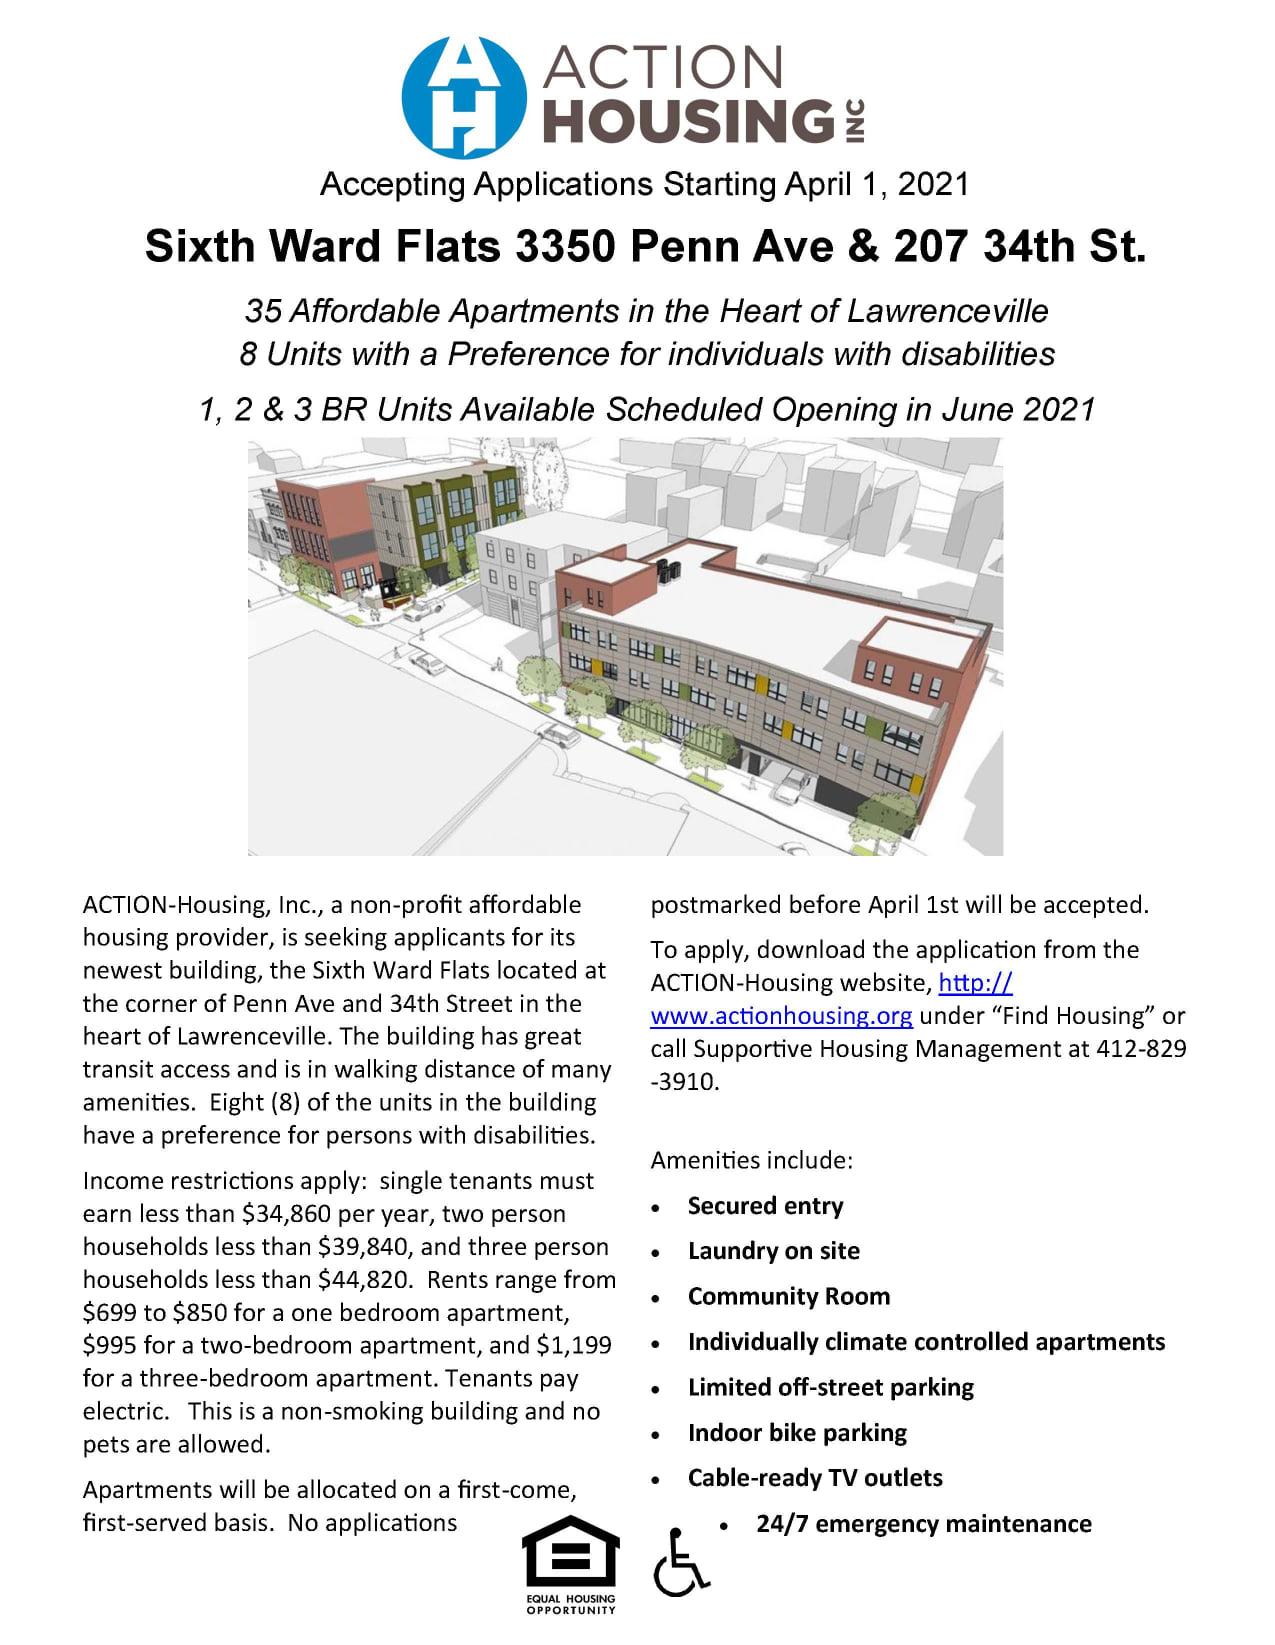 Sixth Ward Flats Housing Flyer